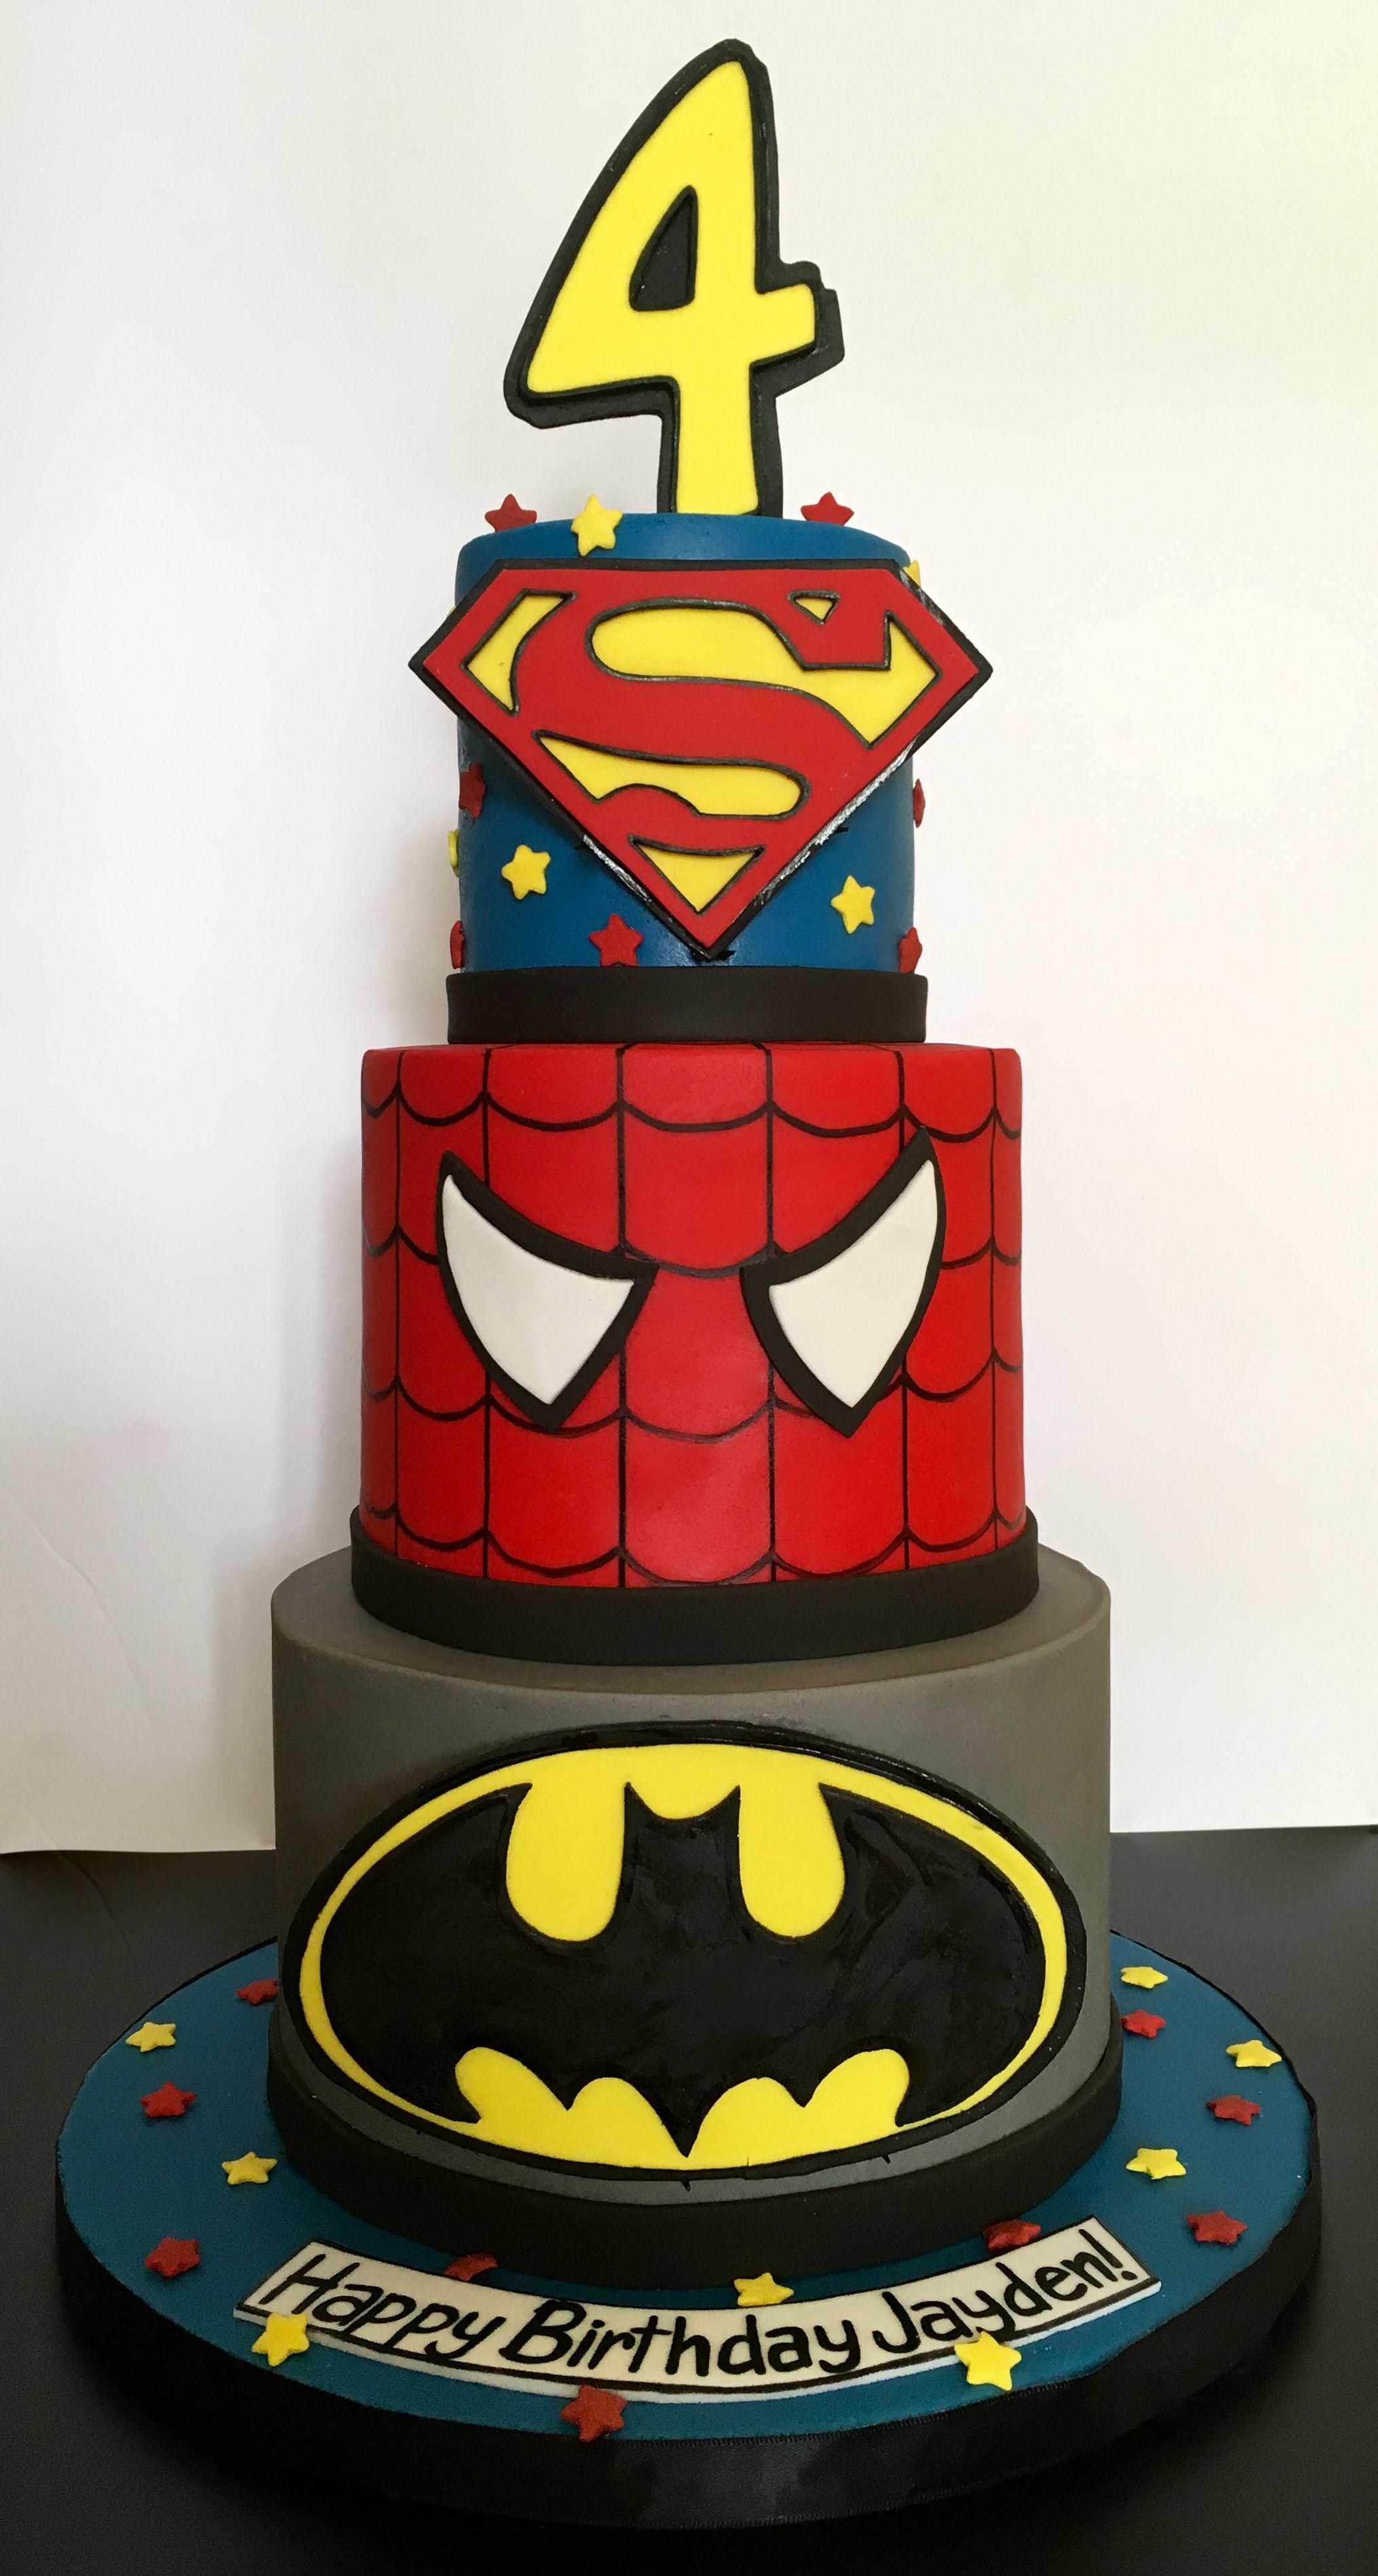 3 Tier Superhero Birthday Cake With Batman Logo Spriderman And